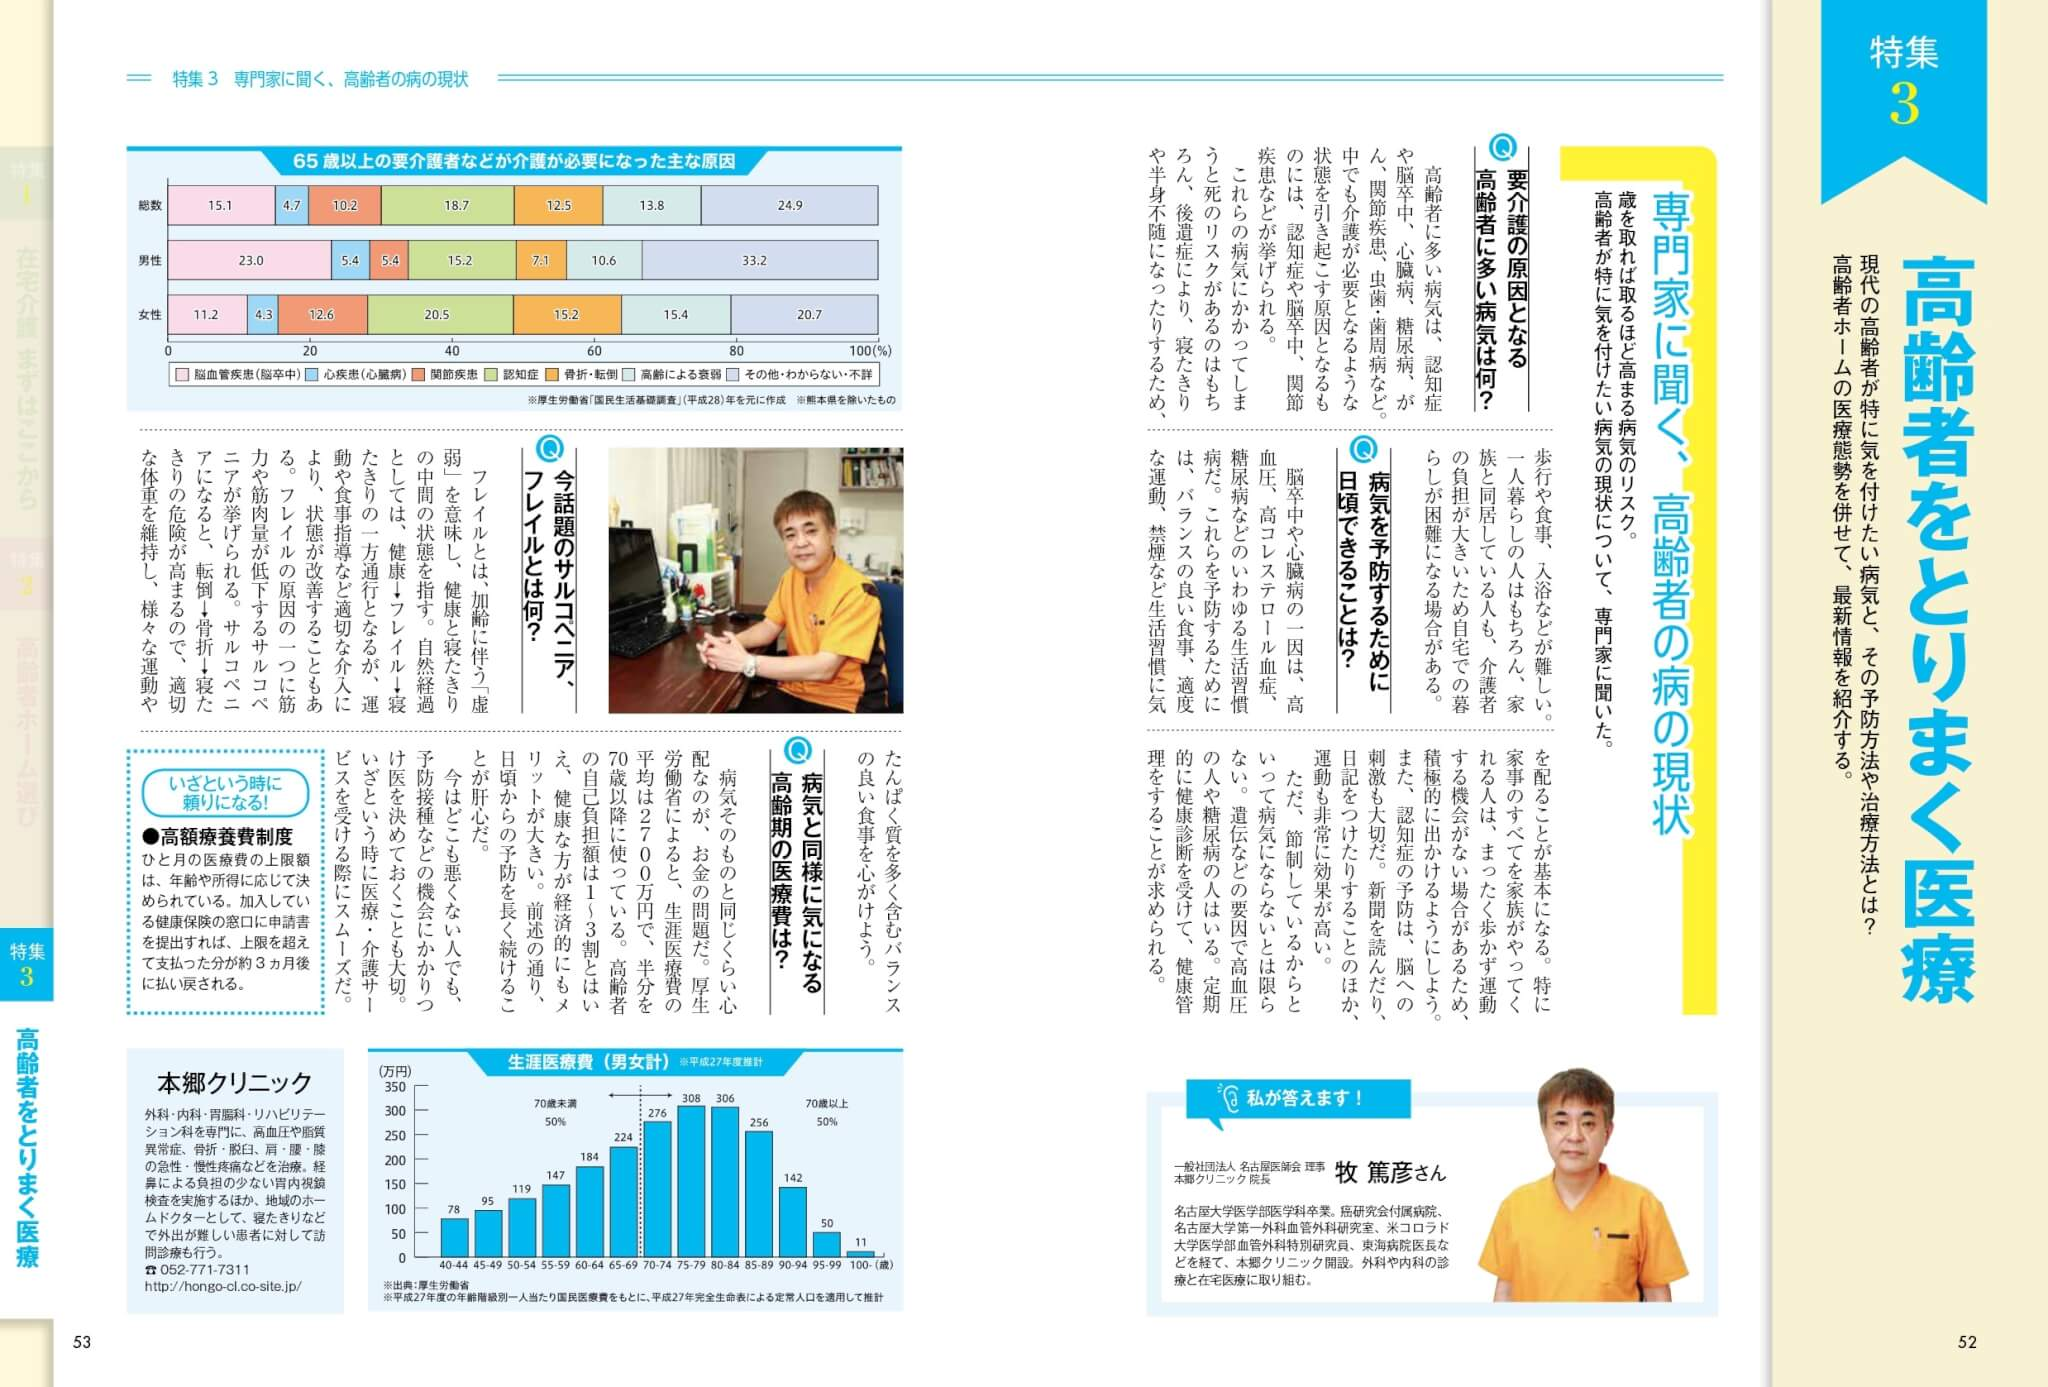 介護実例高齢者ホーム本02